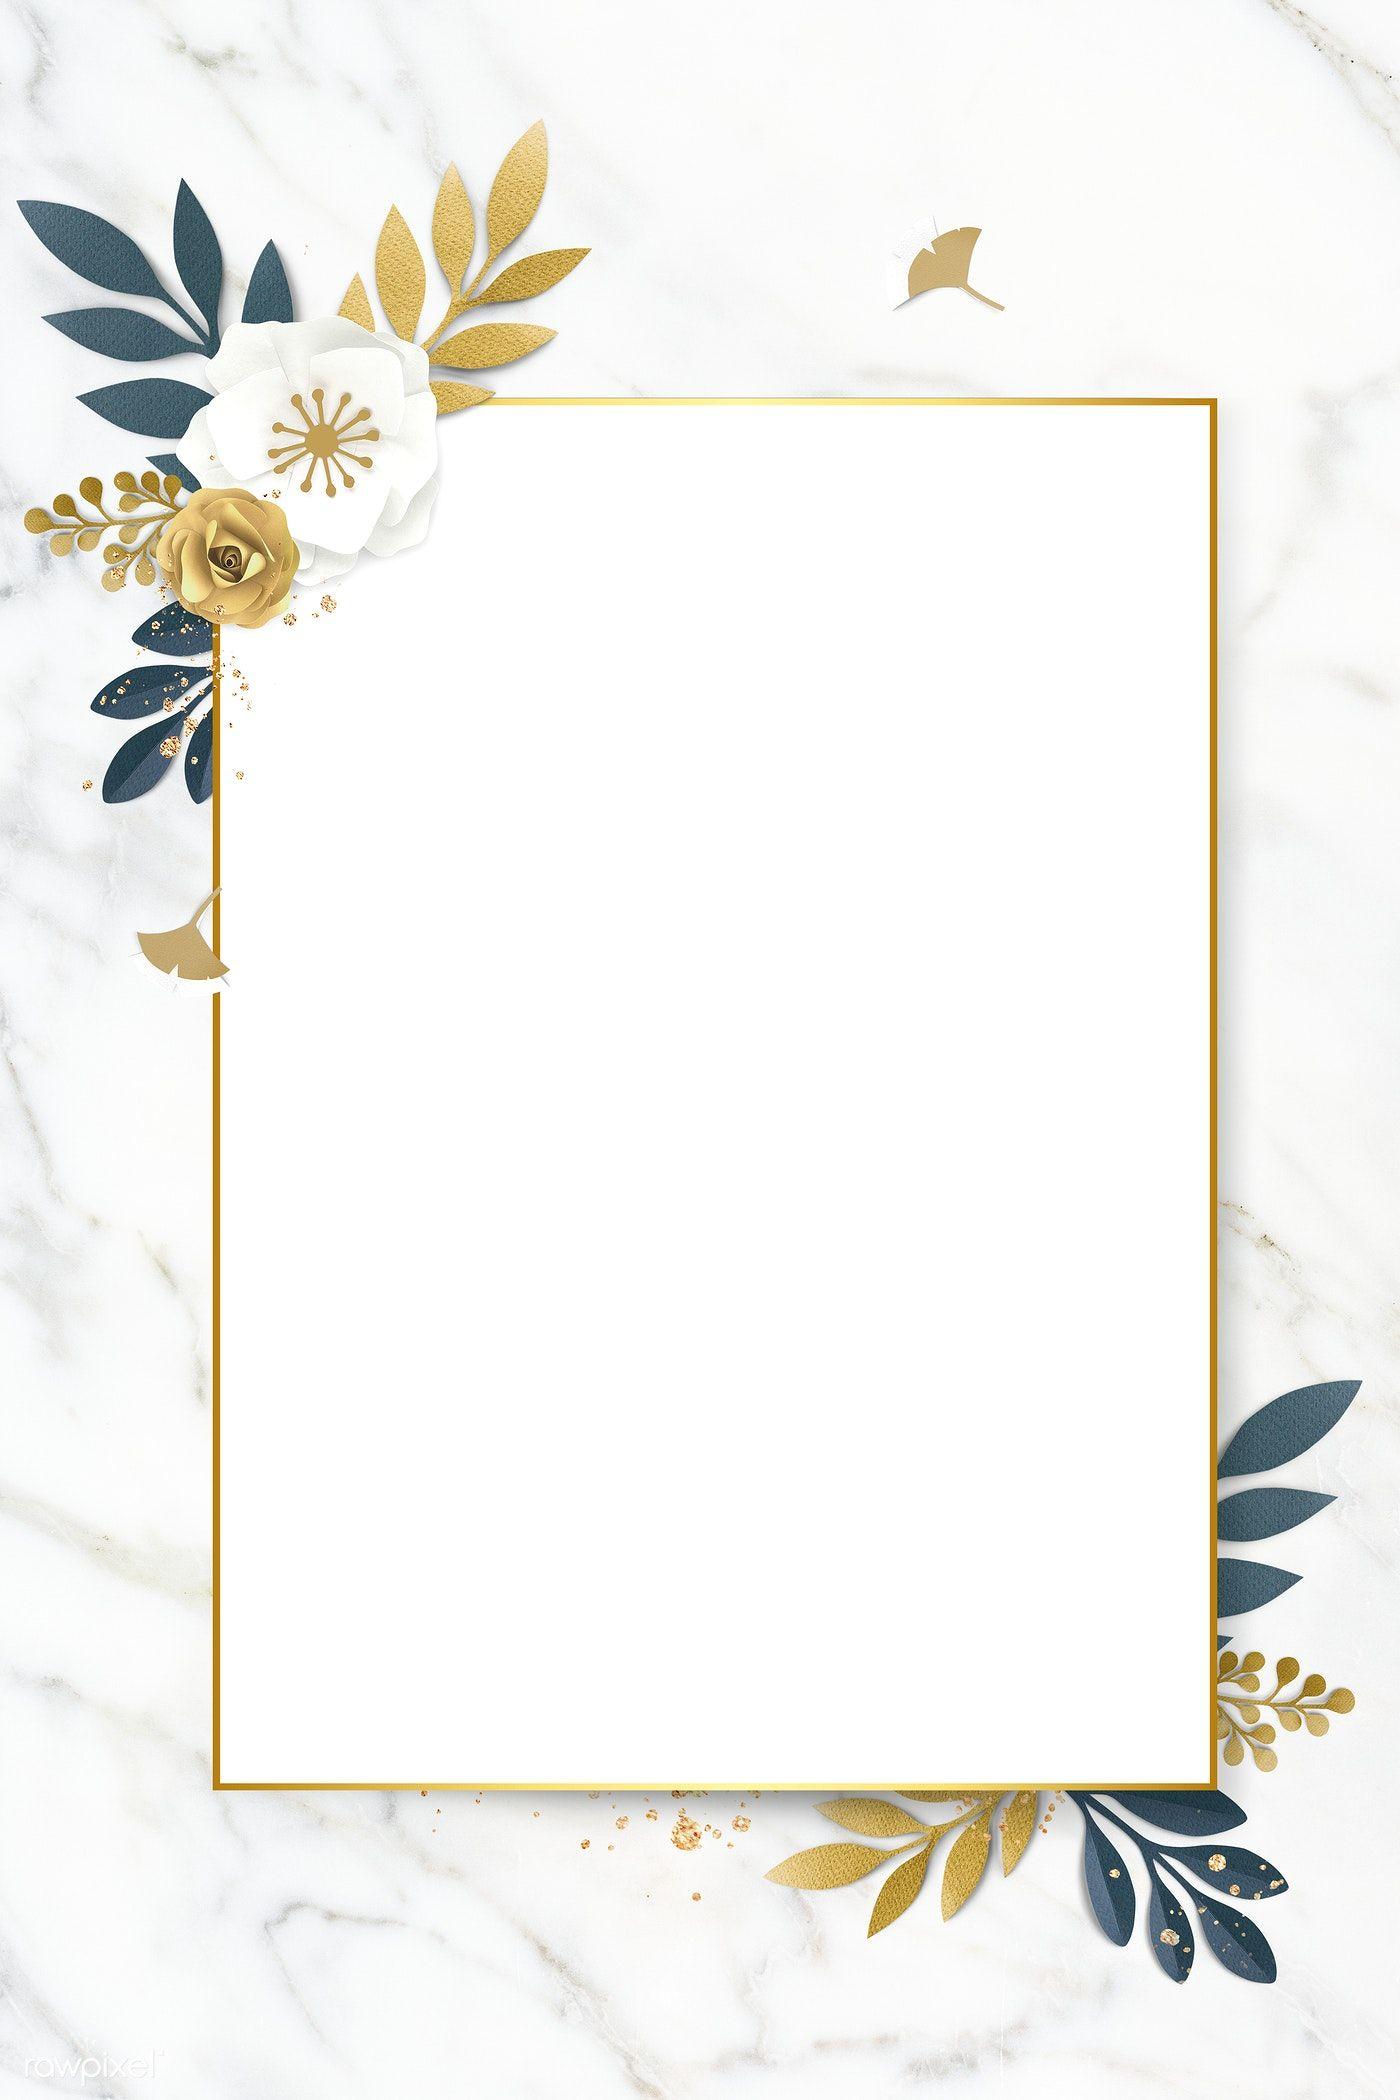 Download premium image of Rectangle paper craft flower